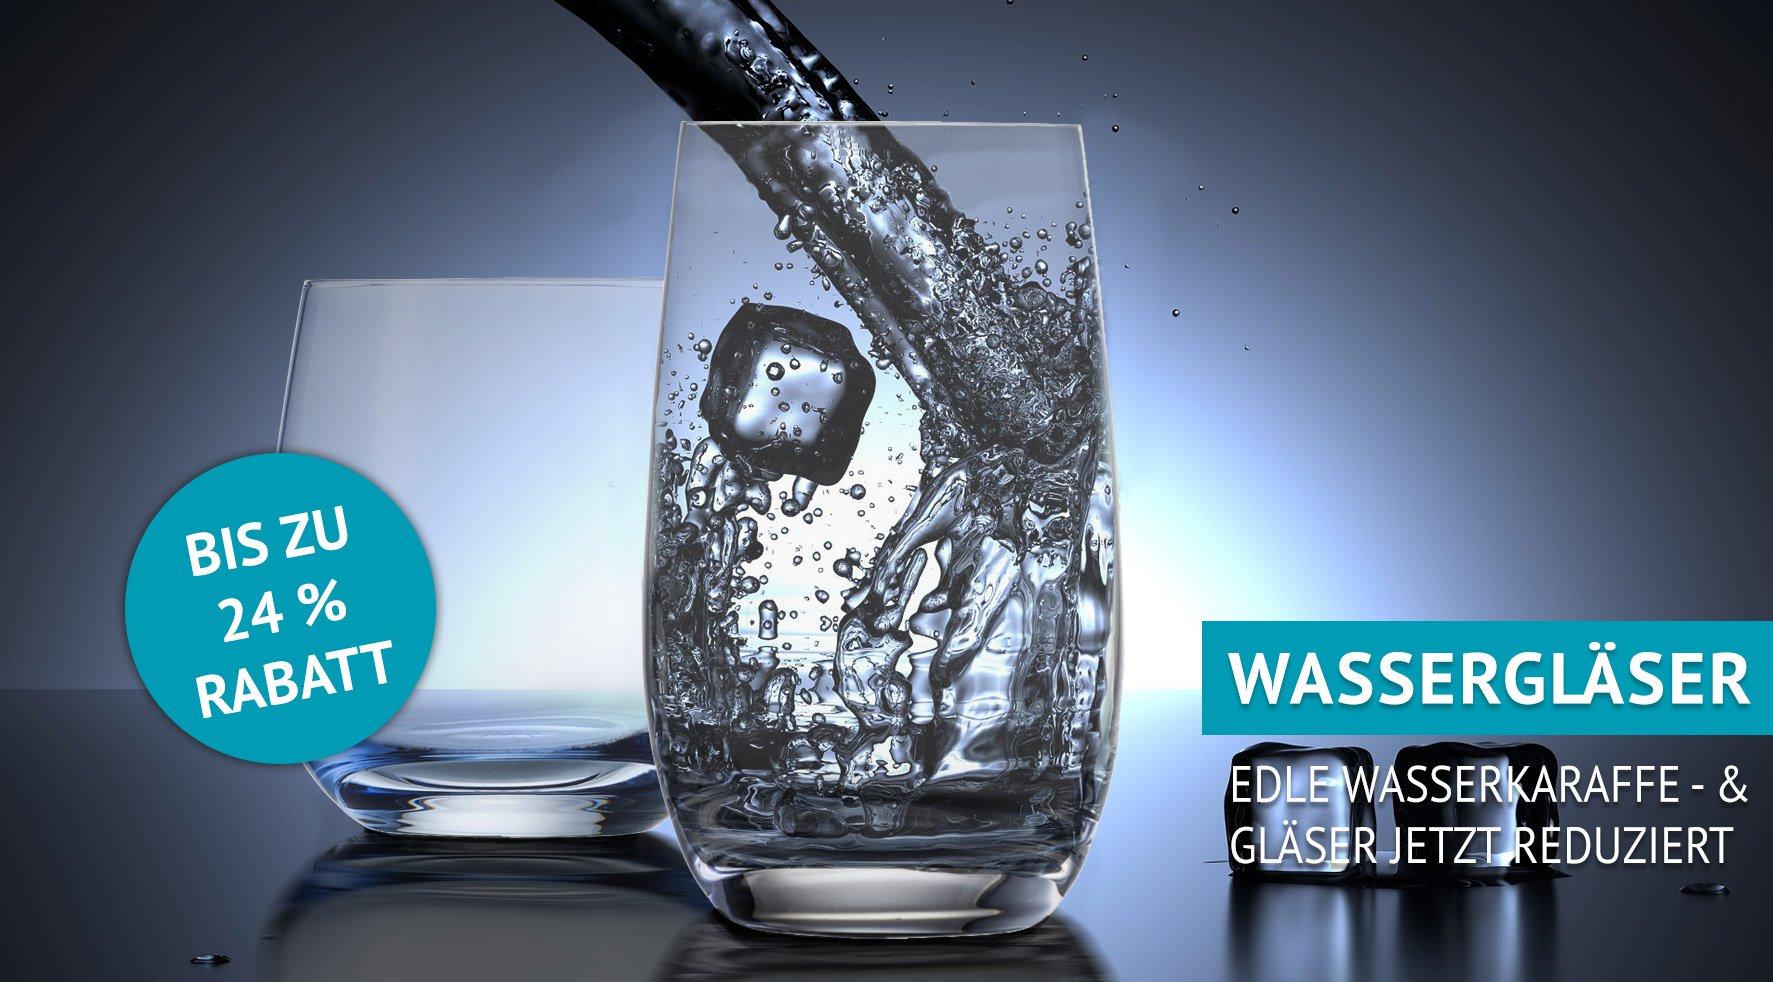 Wasseraktion